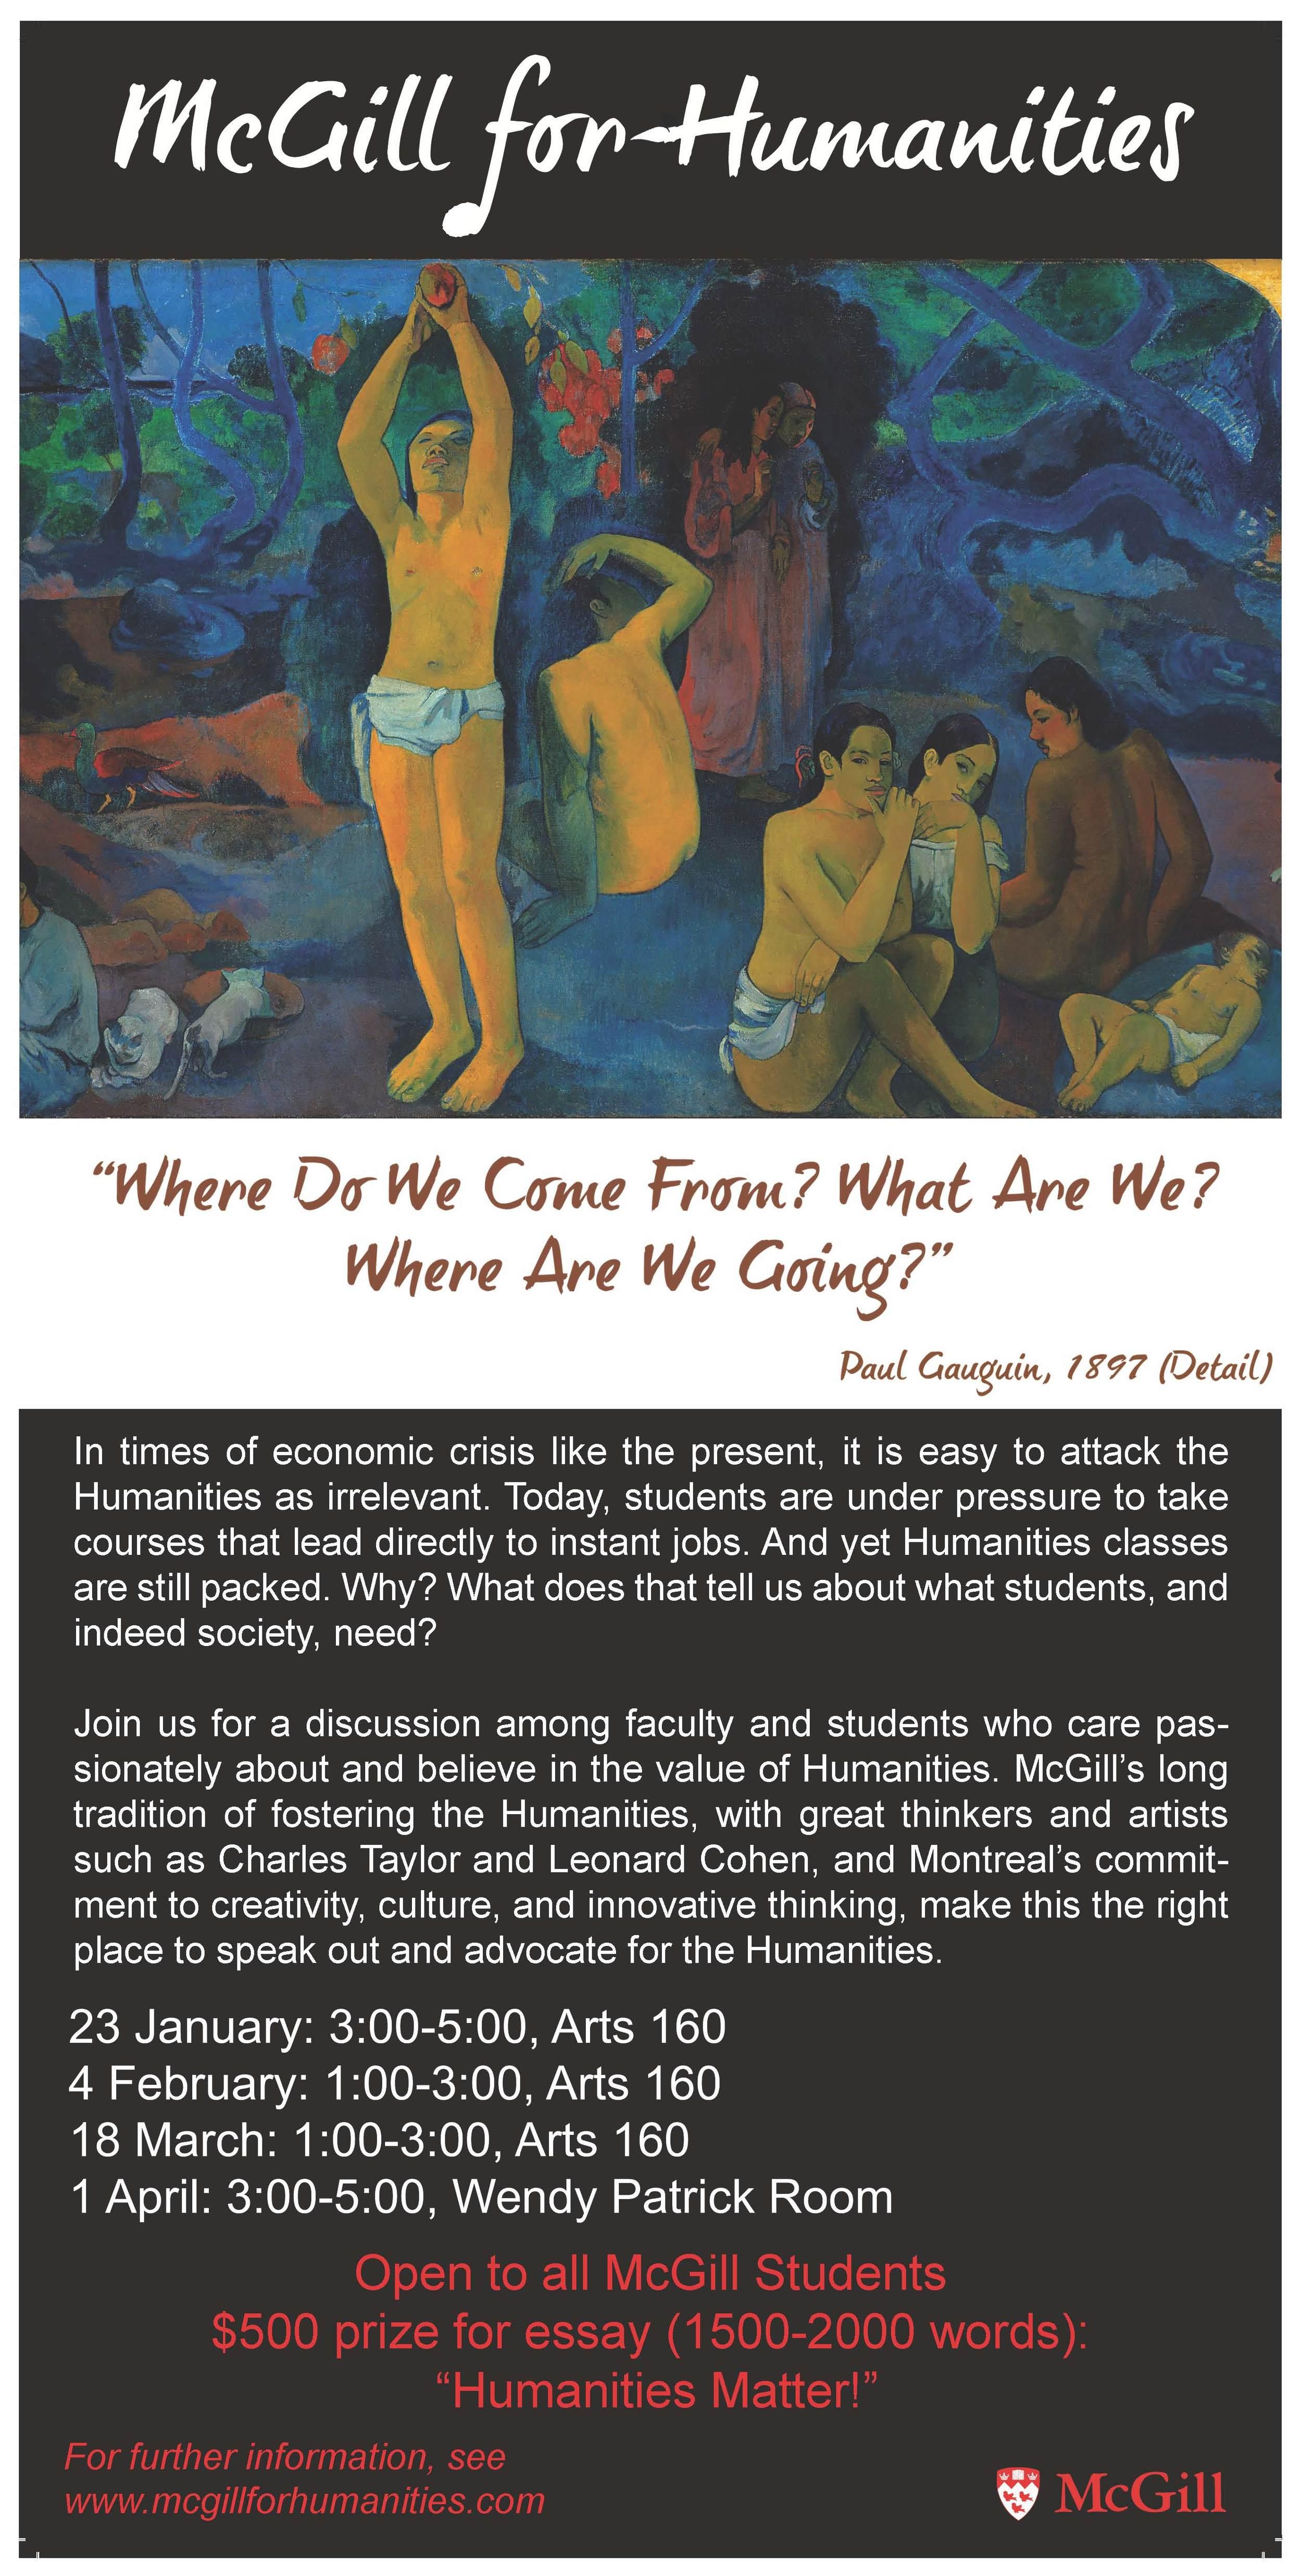 McGill_for_Humanities3.jpg